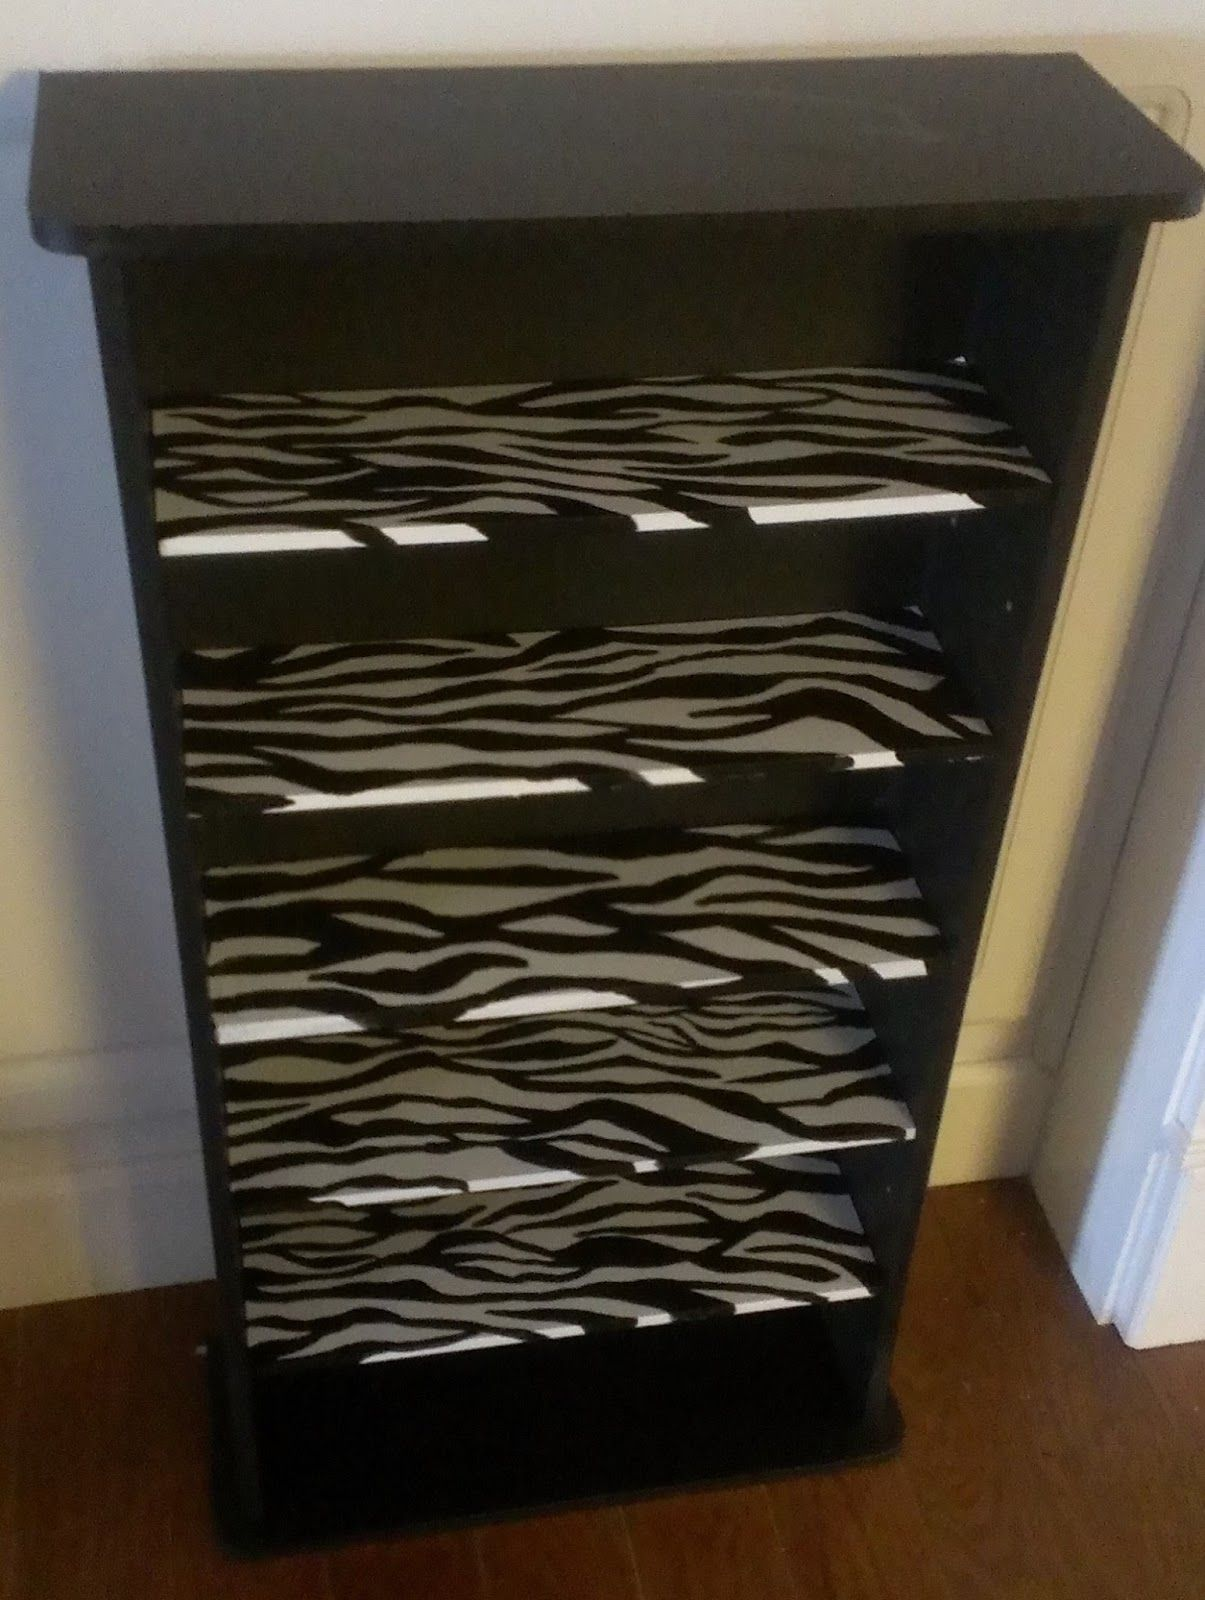 zebra print bedroom furniture. Things I Have Crafted Or Refurbished: Animal Print Furniture Painted Zebra Bedroom C